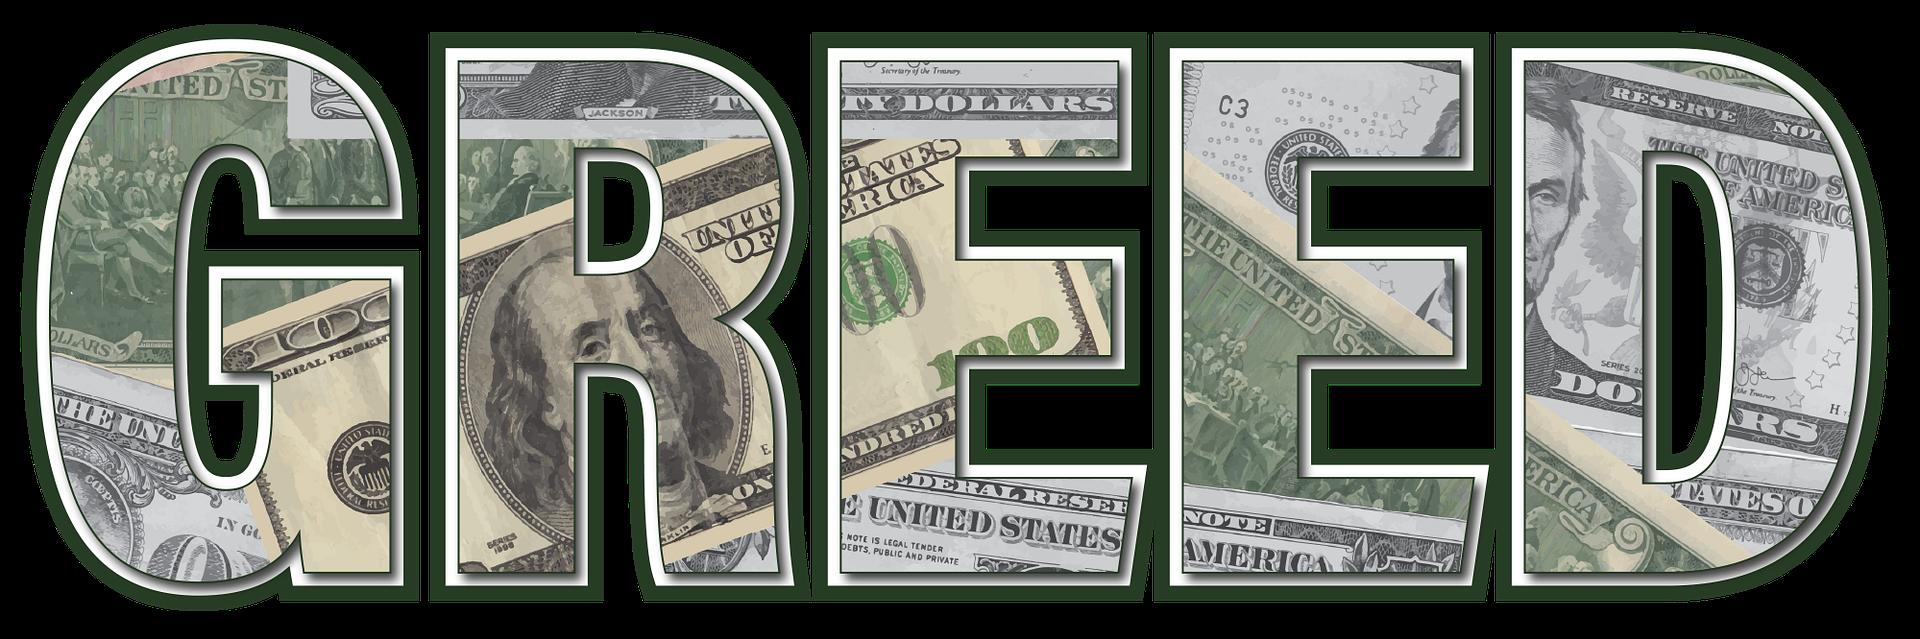 Greed? Random Movement? Value? What Drives Markets?